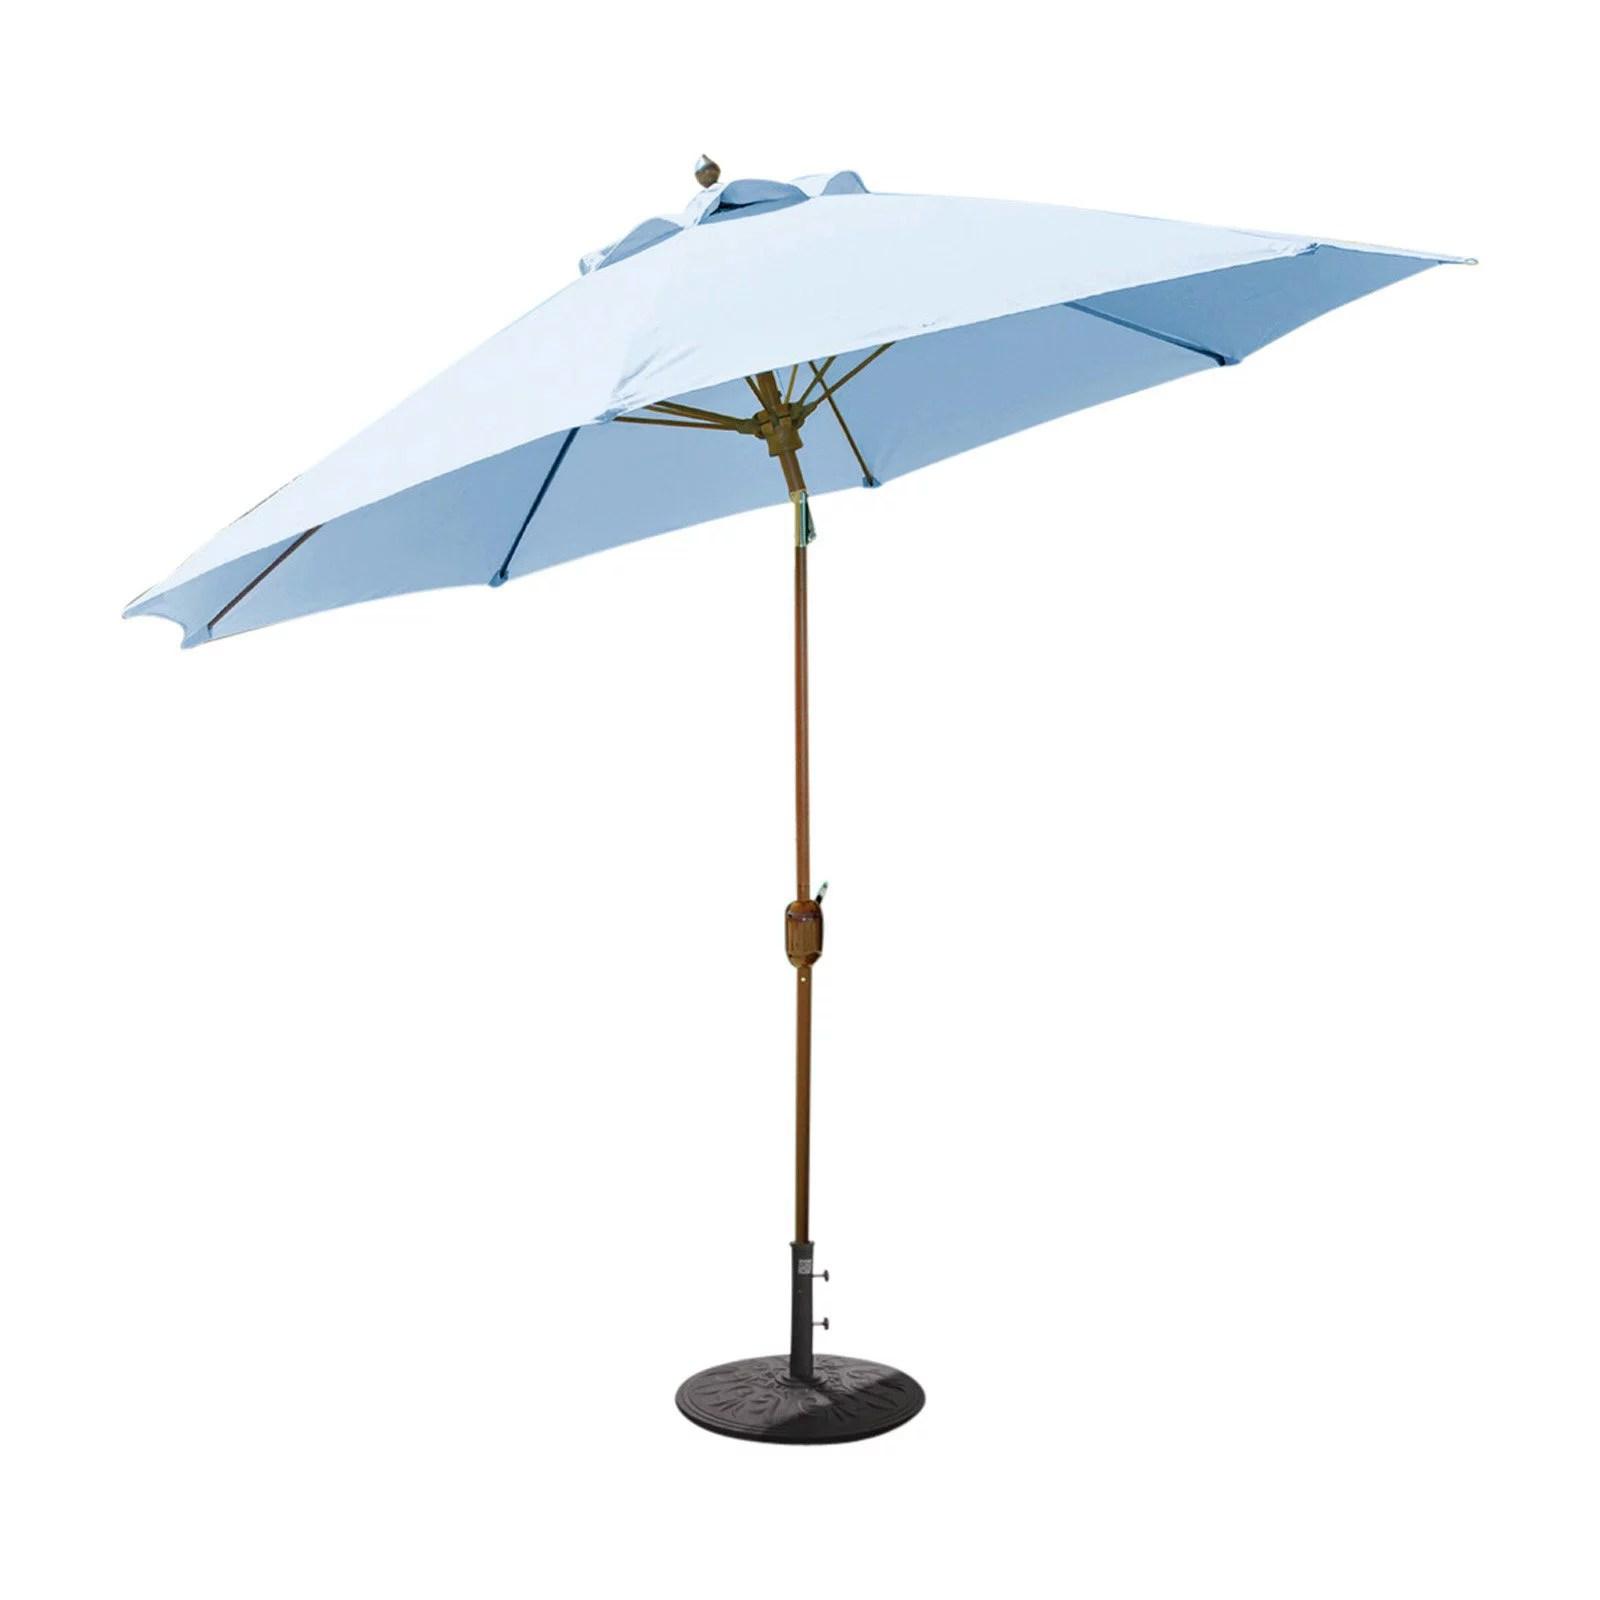 galtech 9 ft aluminum tilt sunbrella patio umbrella